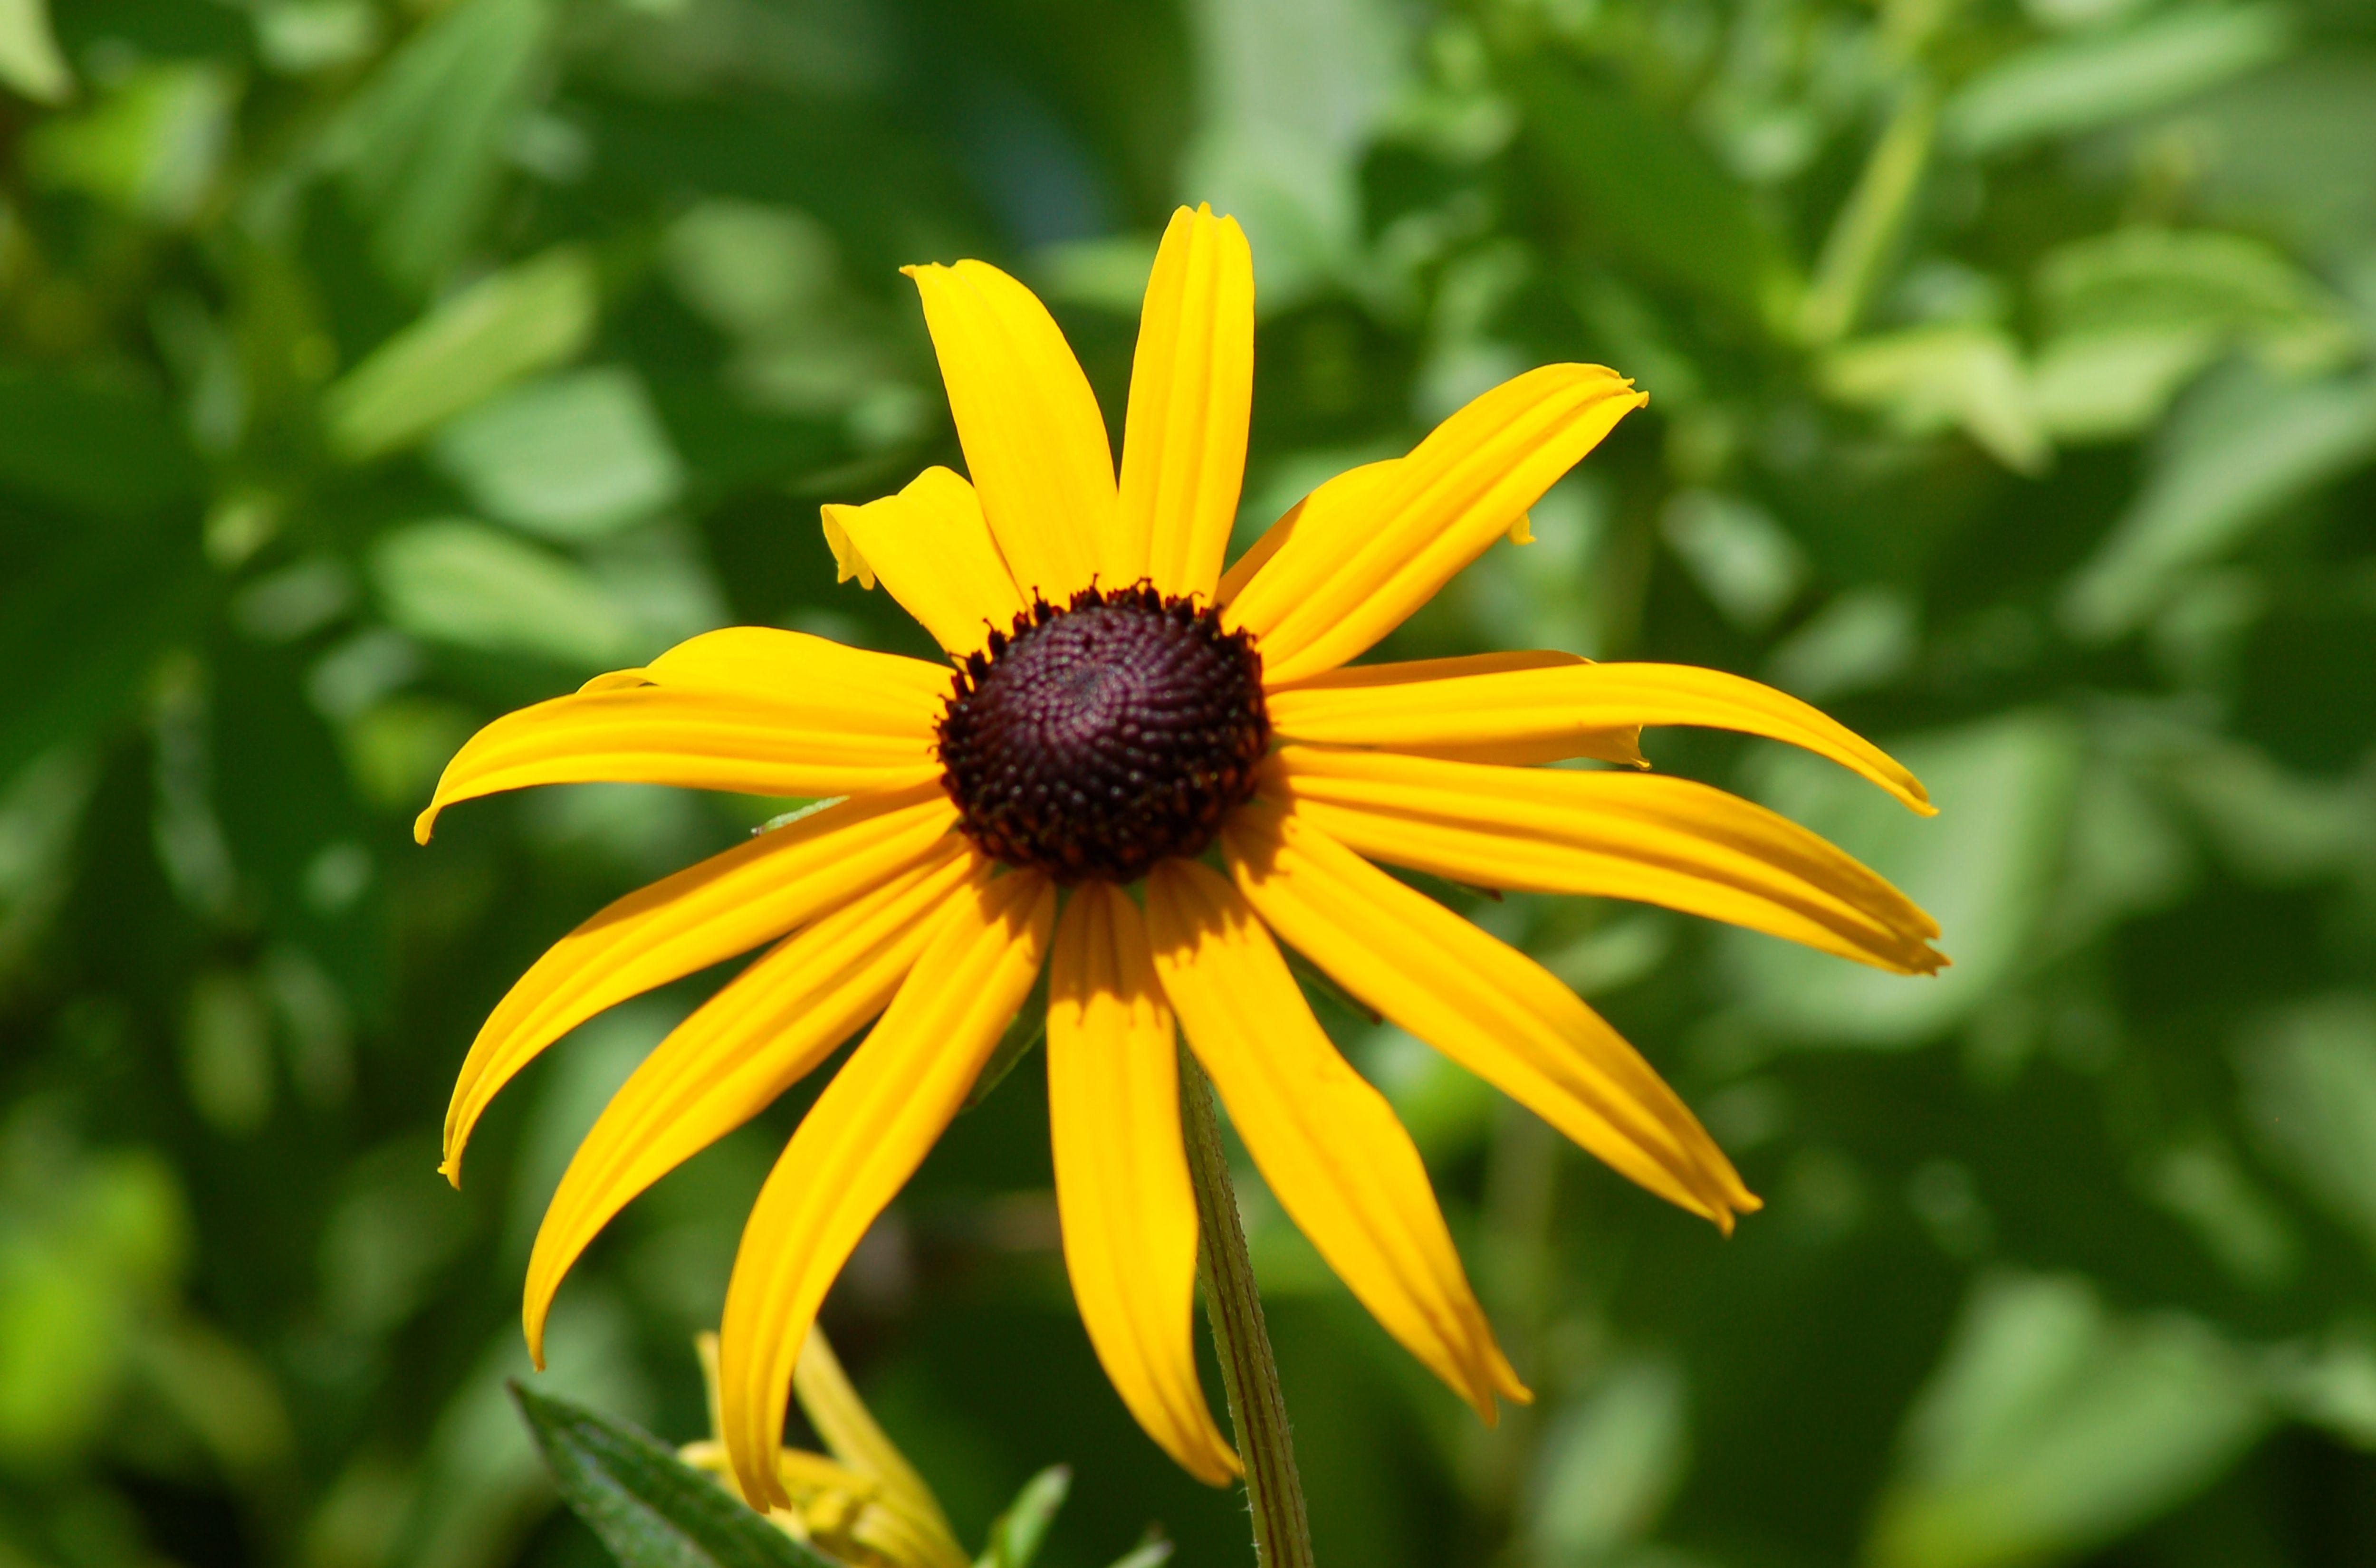 Black-eyed susan flower.